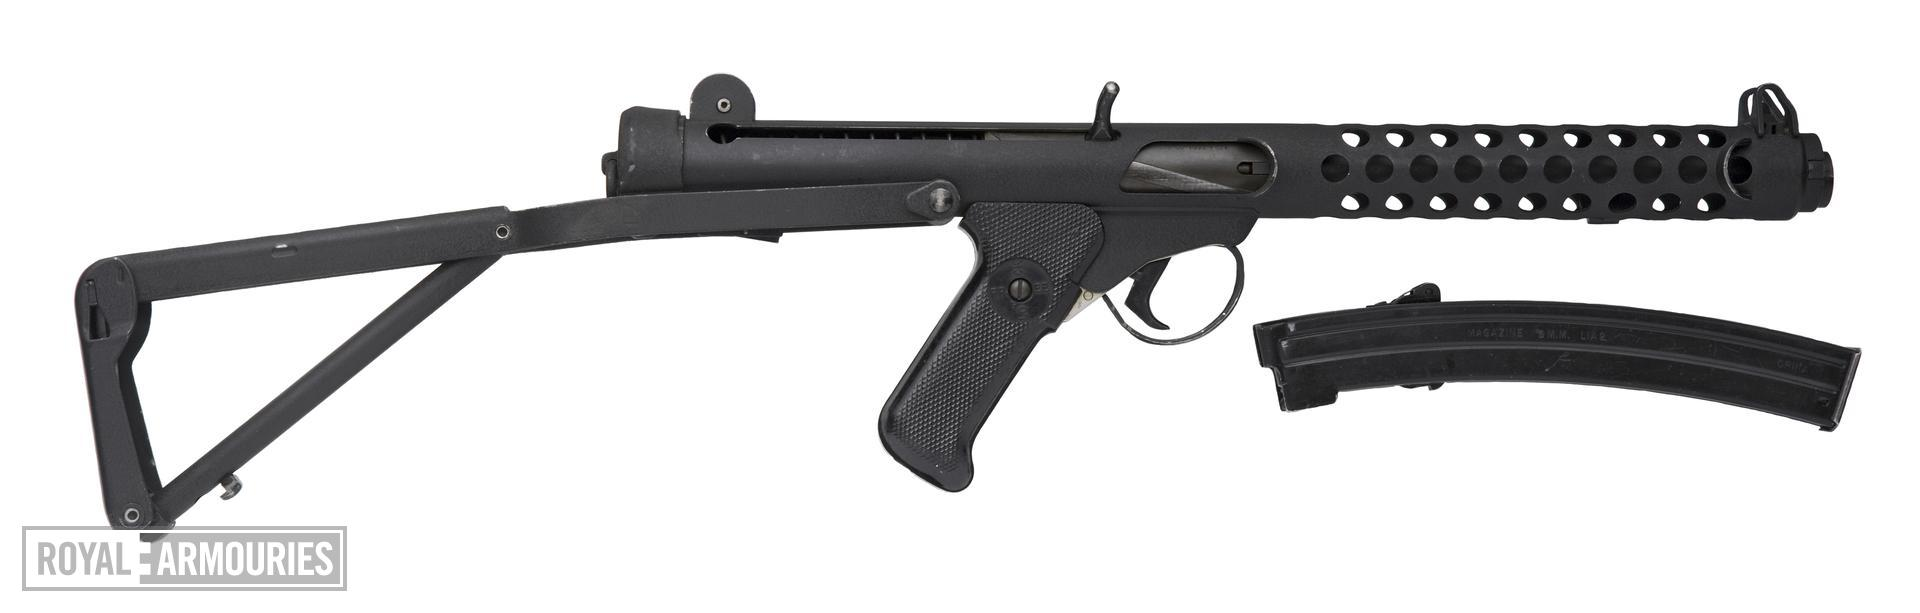 Centrefire automatic submachine gun - Sterling Mk.IV (L2A3)